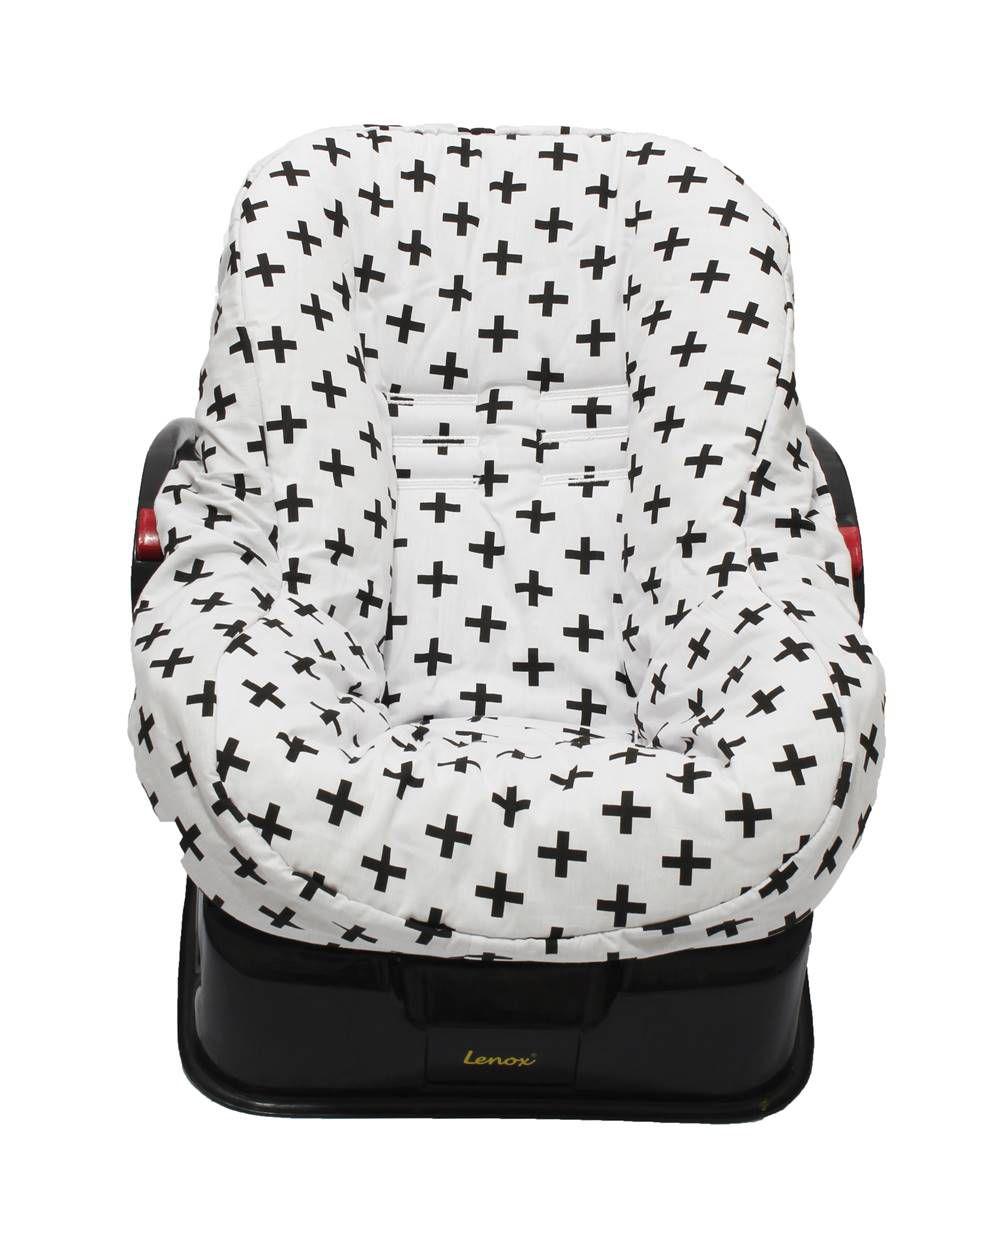 Capa de Bebê Conforto Dupla Face Positivo Preto